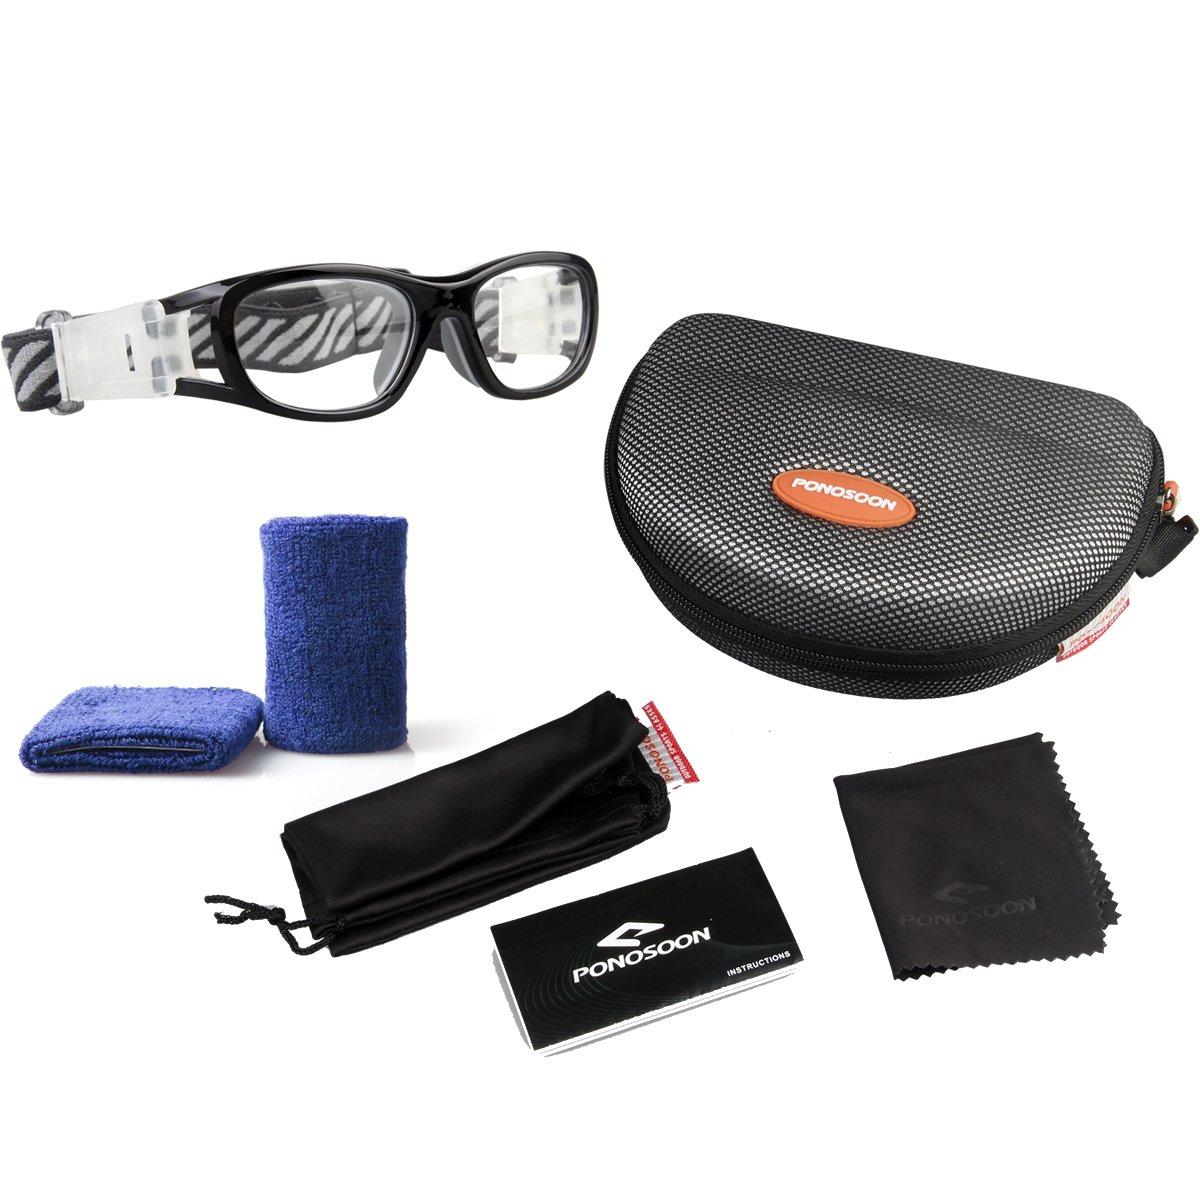 35e9e7f2c0f Amazon.com   PONOSOON Sports Goggles Glasses for Kids for Basketball  Football Volleyball 1812(Black)   Sports   Outdoors